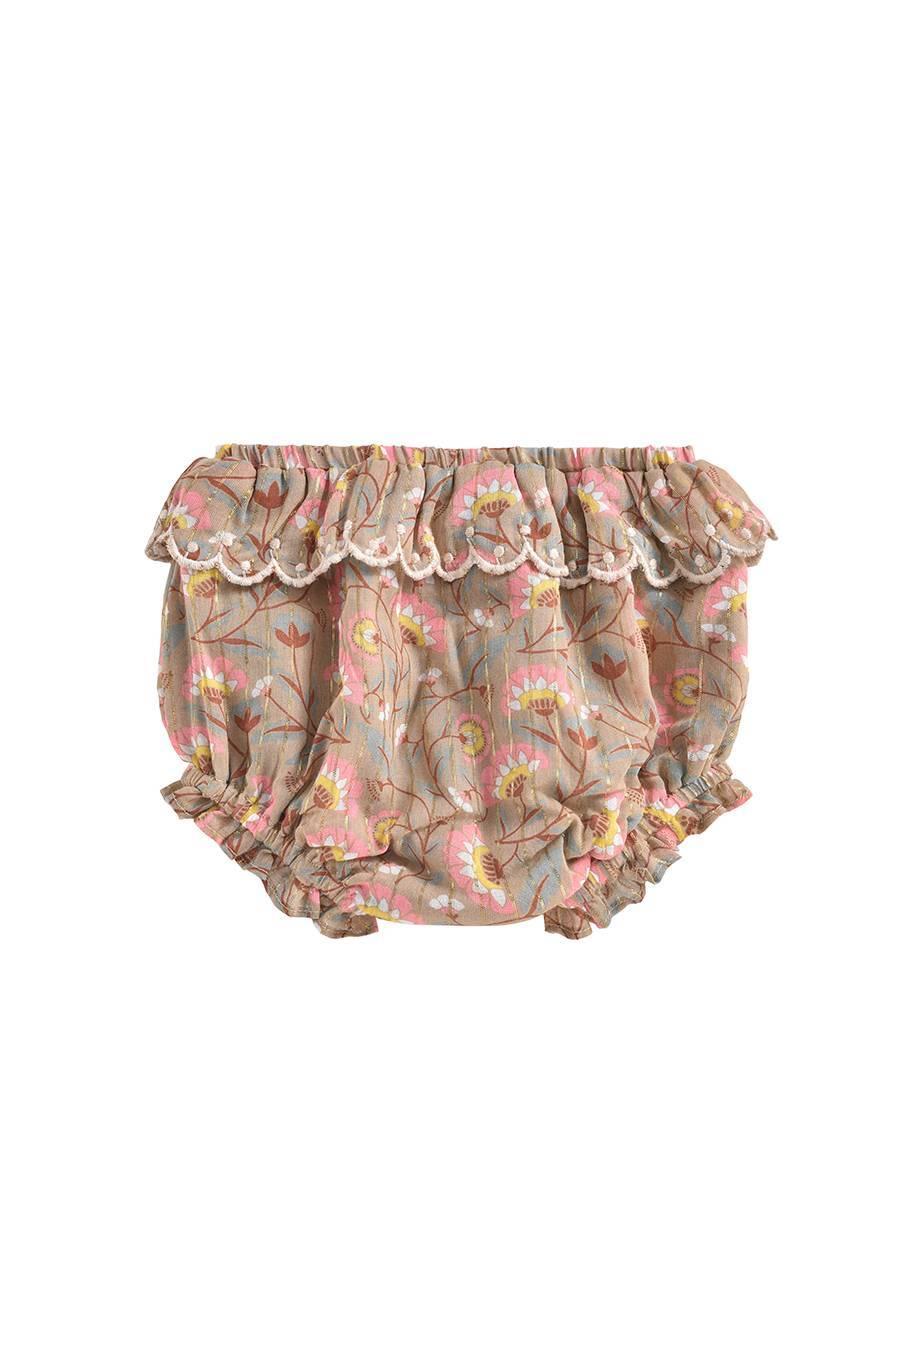 boheme chic vintage bloomer bébé fille janelle khaki folk flowers